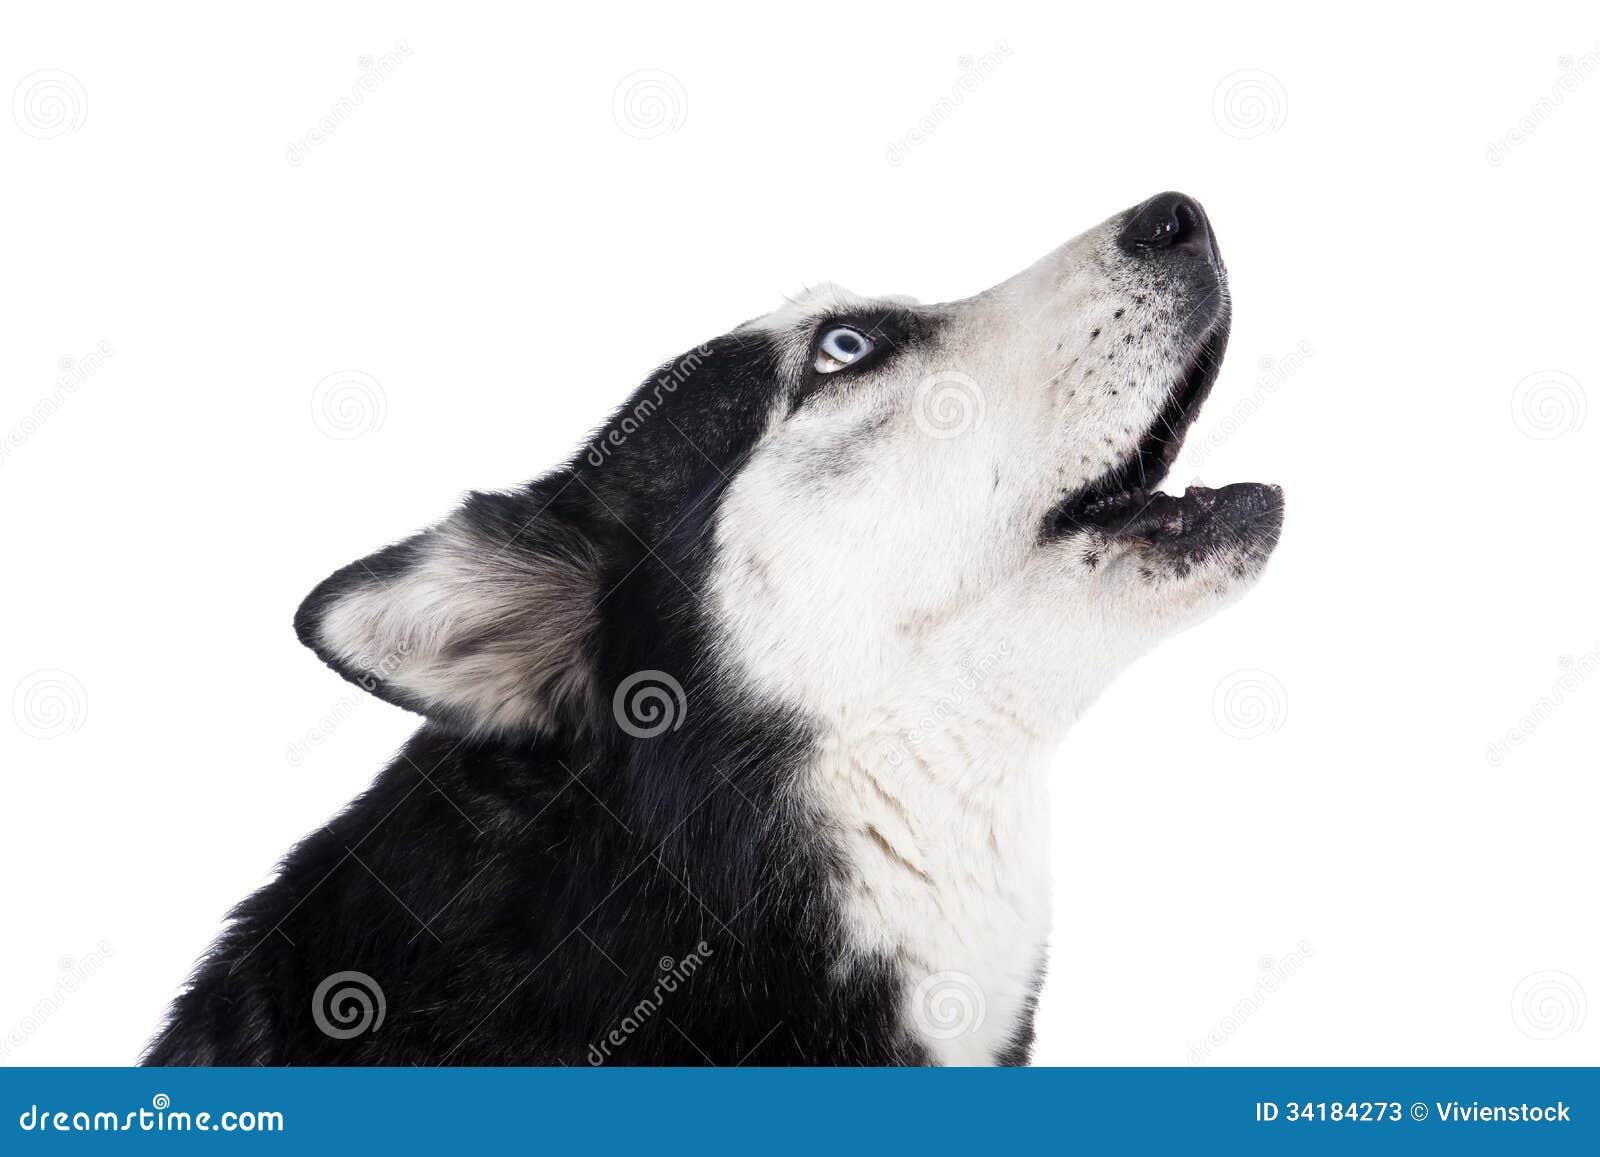 Siberian Husky Howling Stock Image Image Of Siberian 34184273